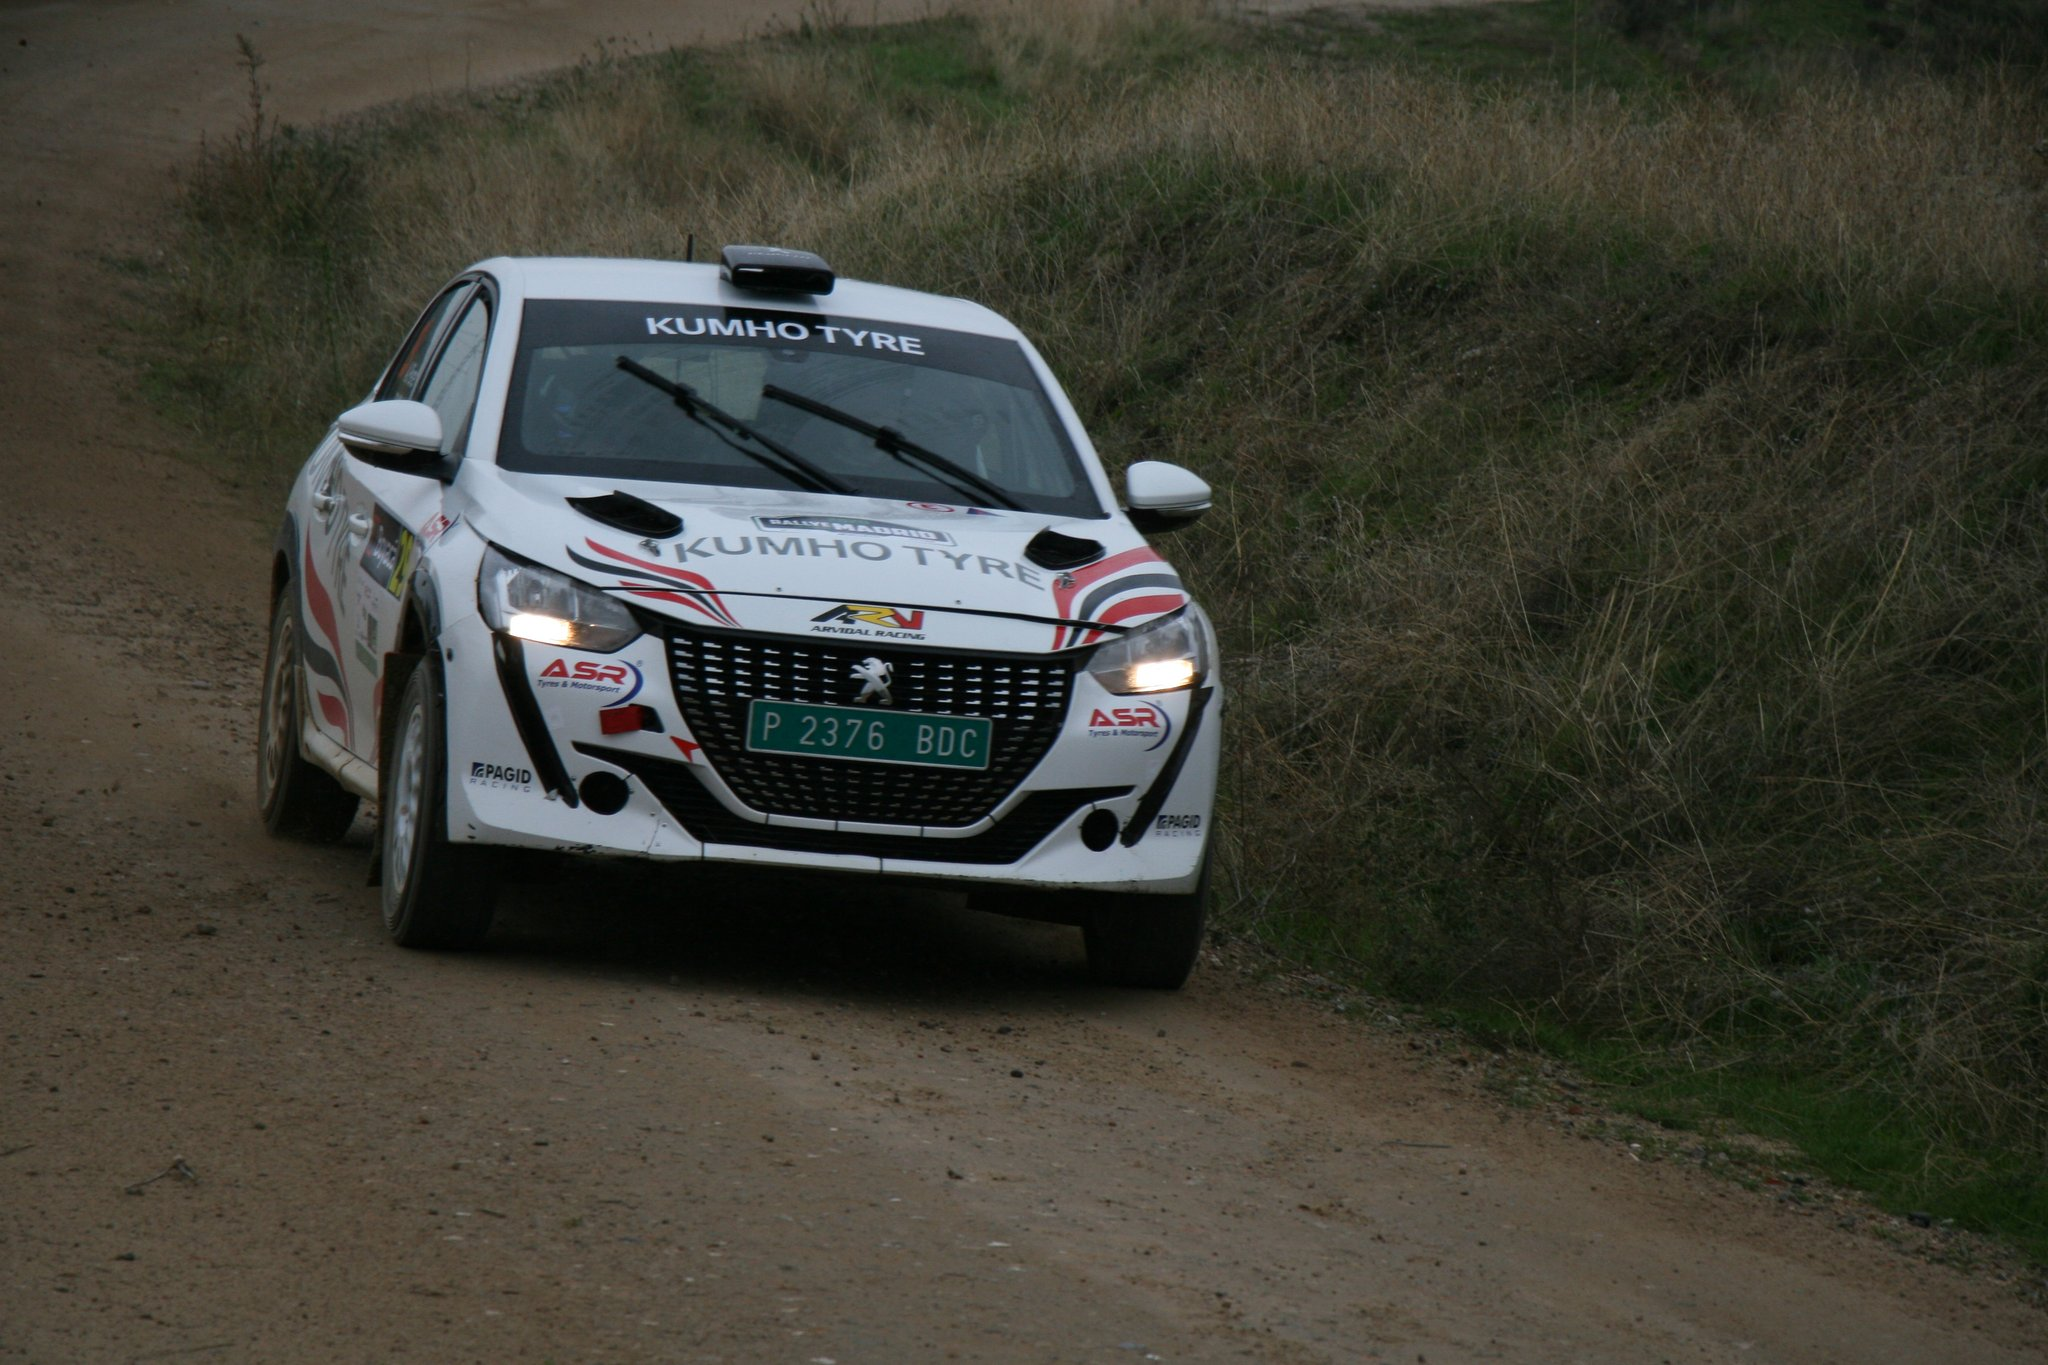 SCER + CERT: Rallye de Tierra de Madrid [13-14 Noviembre] - Página 3 Emx6p2aWEAEELv_?format=jpg&name=large